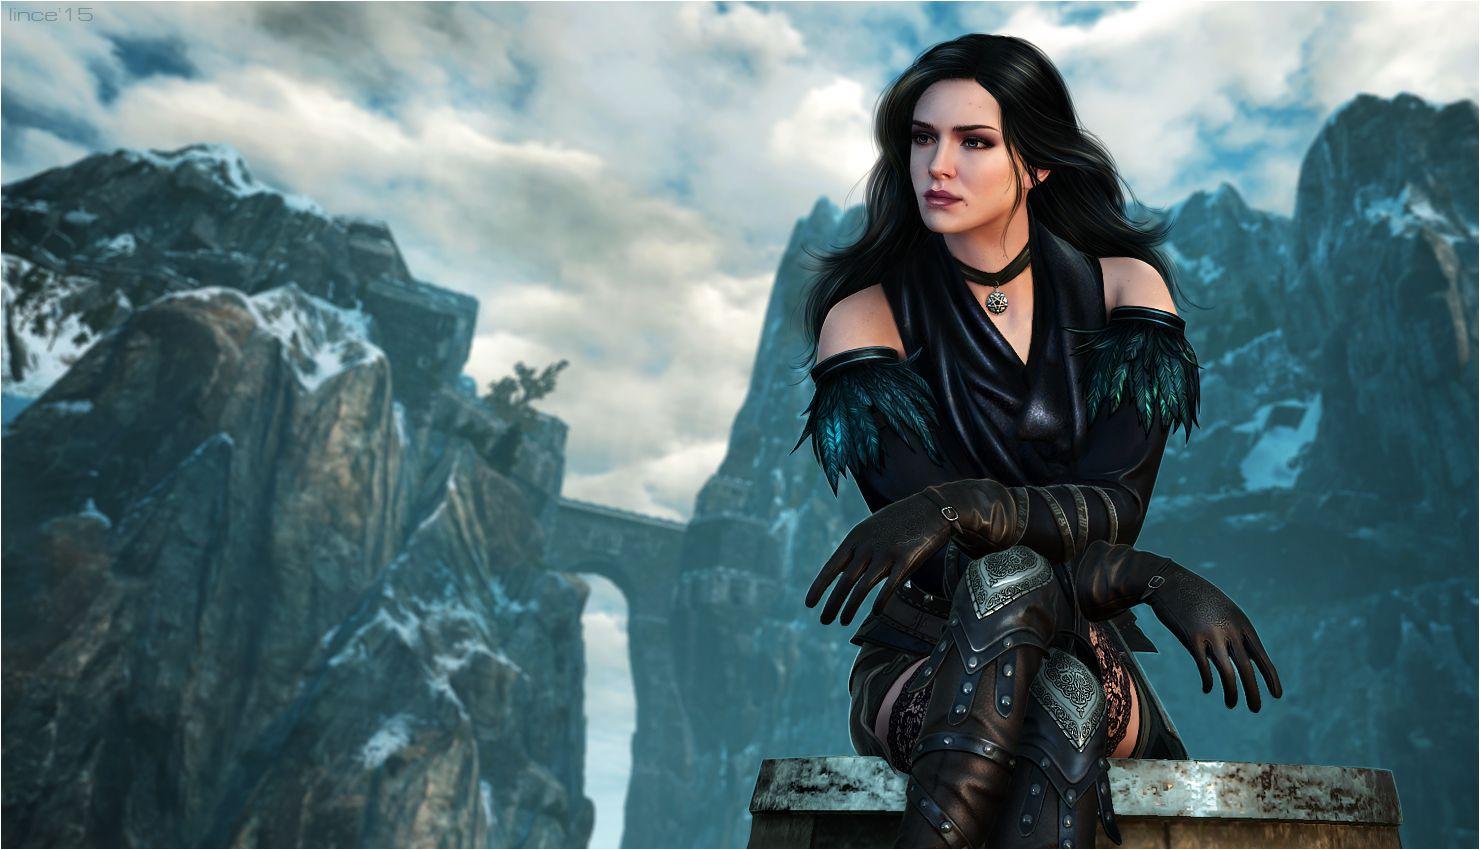 The Witcher 3. Yennefer by linceeslanieva on DeviantArt